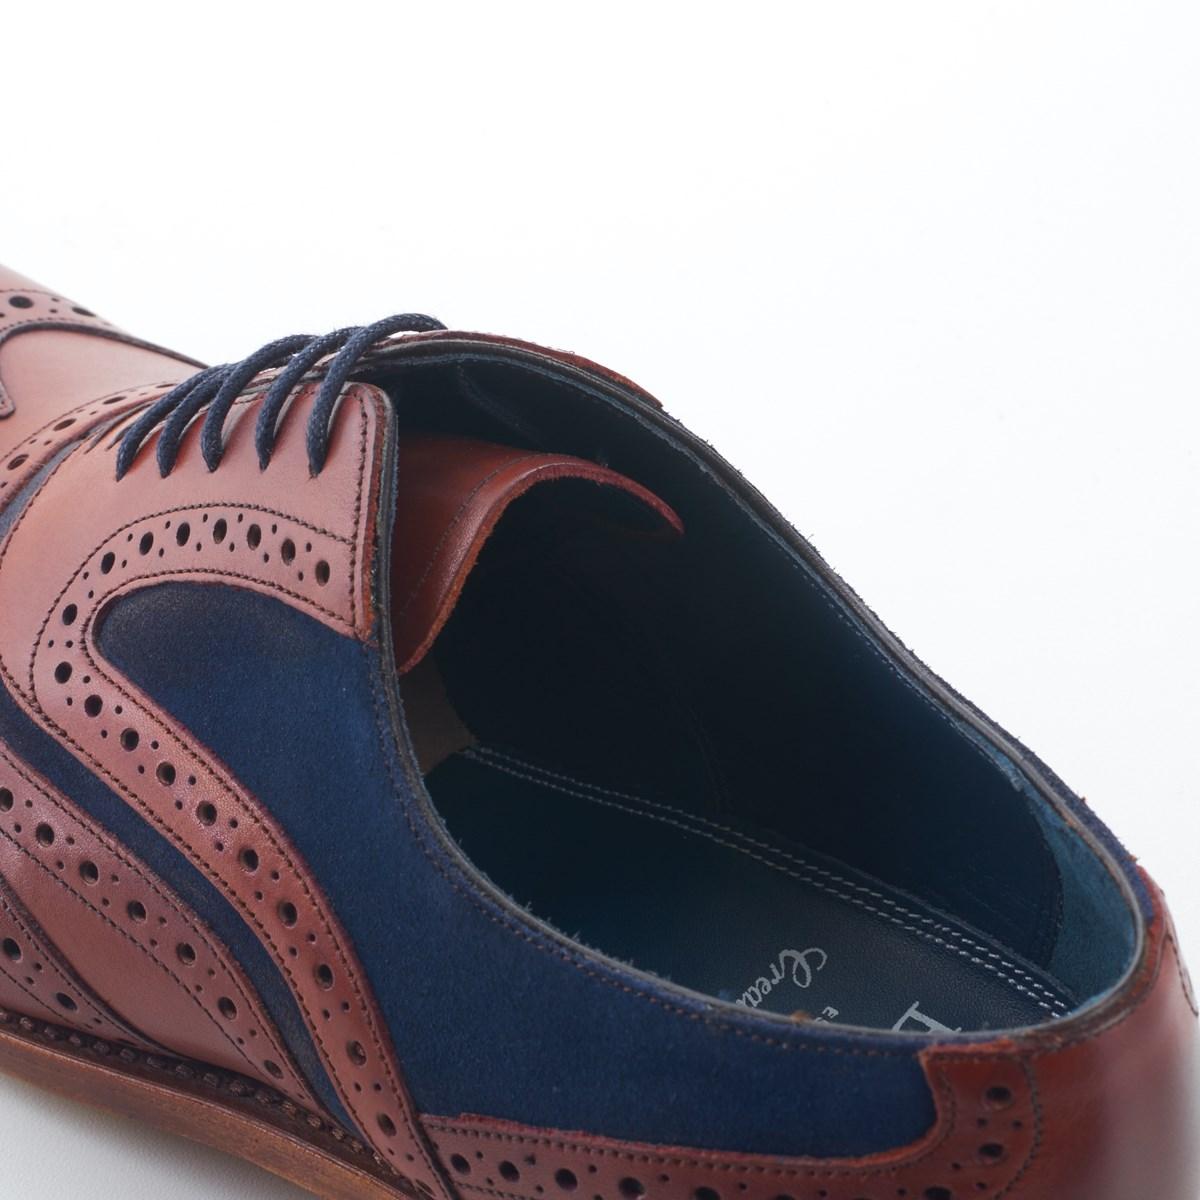 8ff22a01414db Dress Brogue Wingtip McClean Rosewood and Navy by Barker ·  1203052_barker_shoe_mcclean_rwn_3070_3128 ·  1203052_barker_shoe_mcclean_rwn_3072_3130